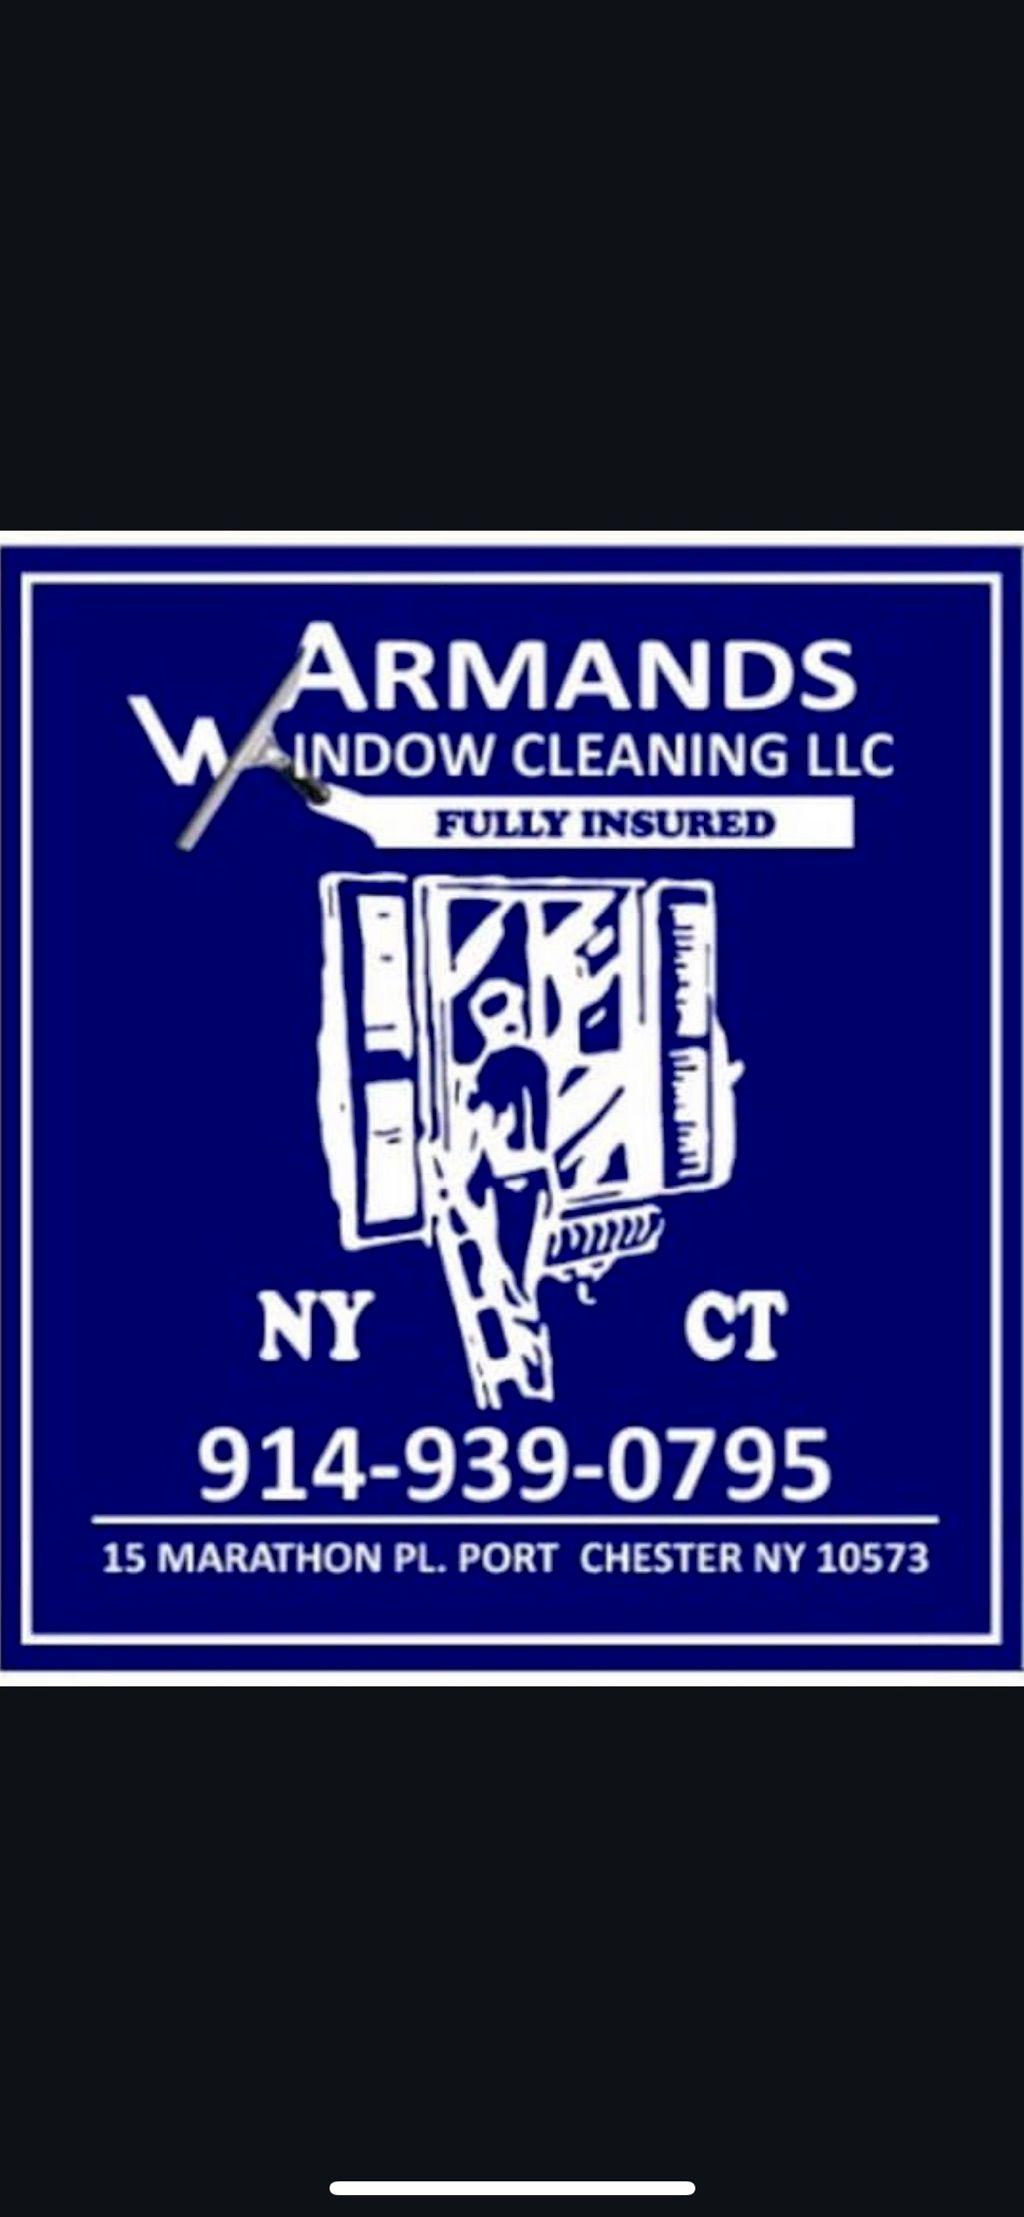 Armands Window Cleaning LLC